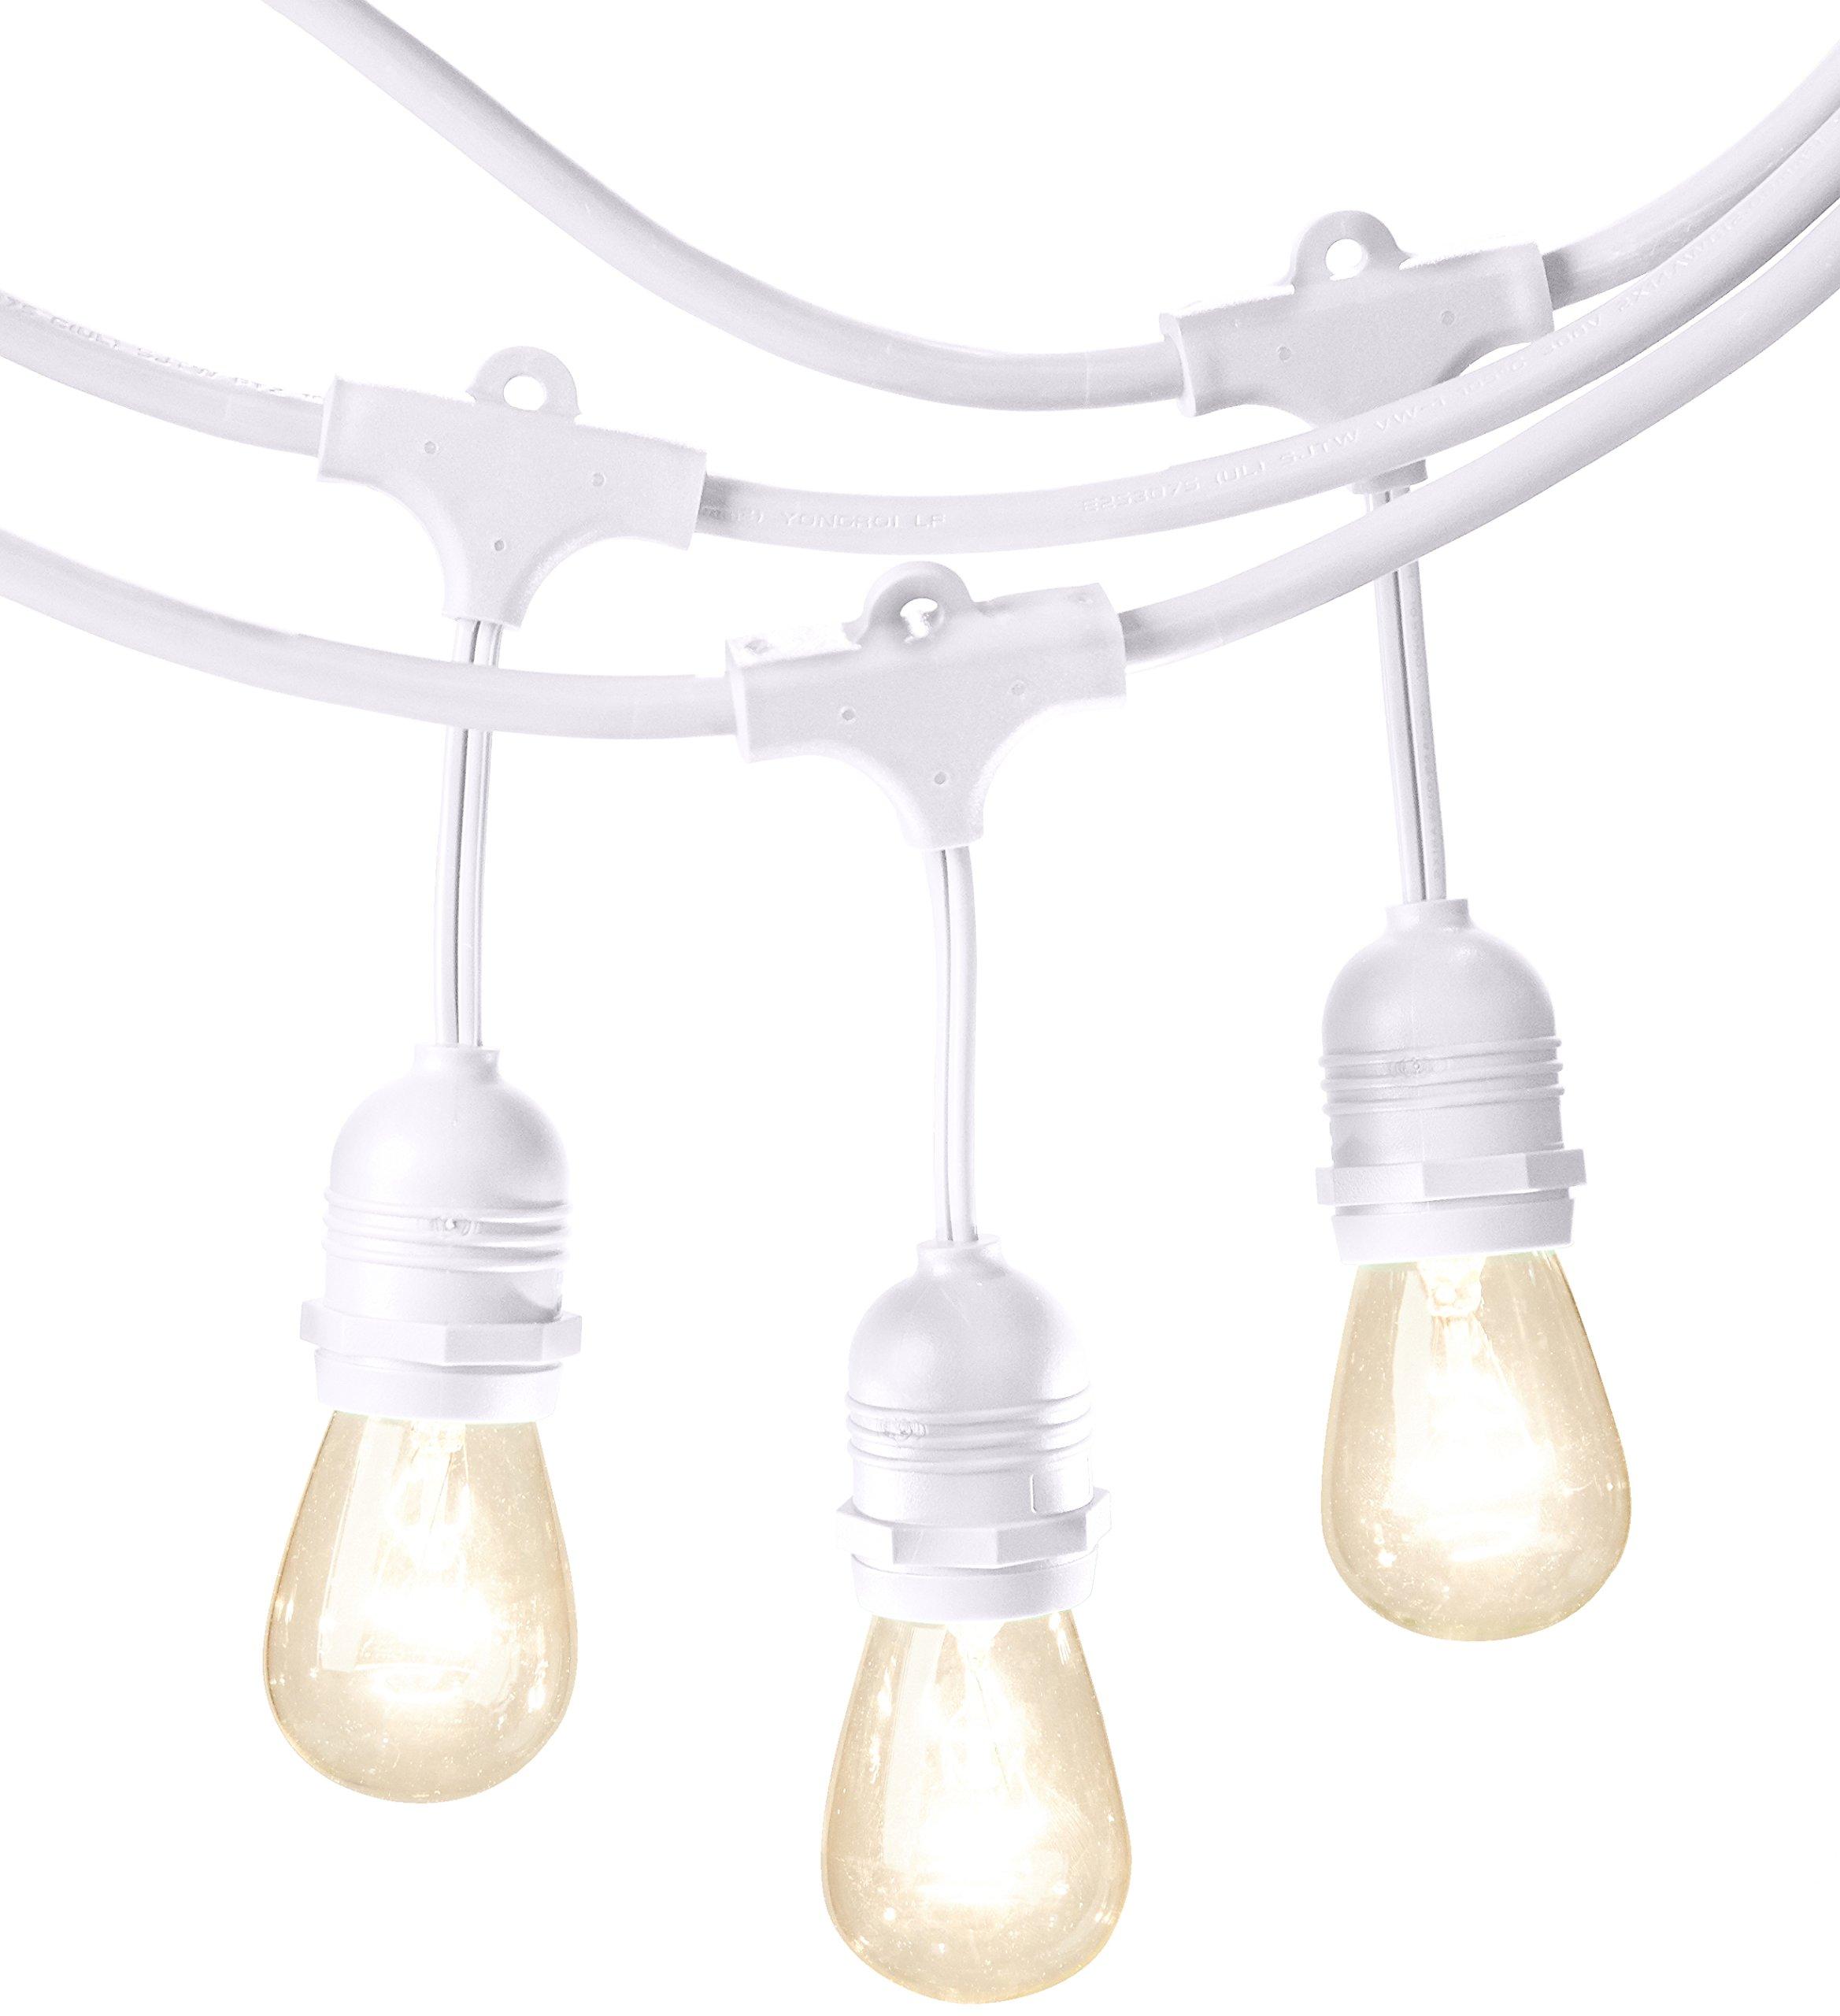 AmazonBasics Weatherproof Outdoor Patio String Lights With 15 S14 Globe Light Bulbs - 48 Foot, White